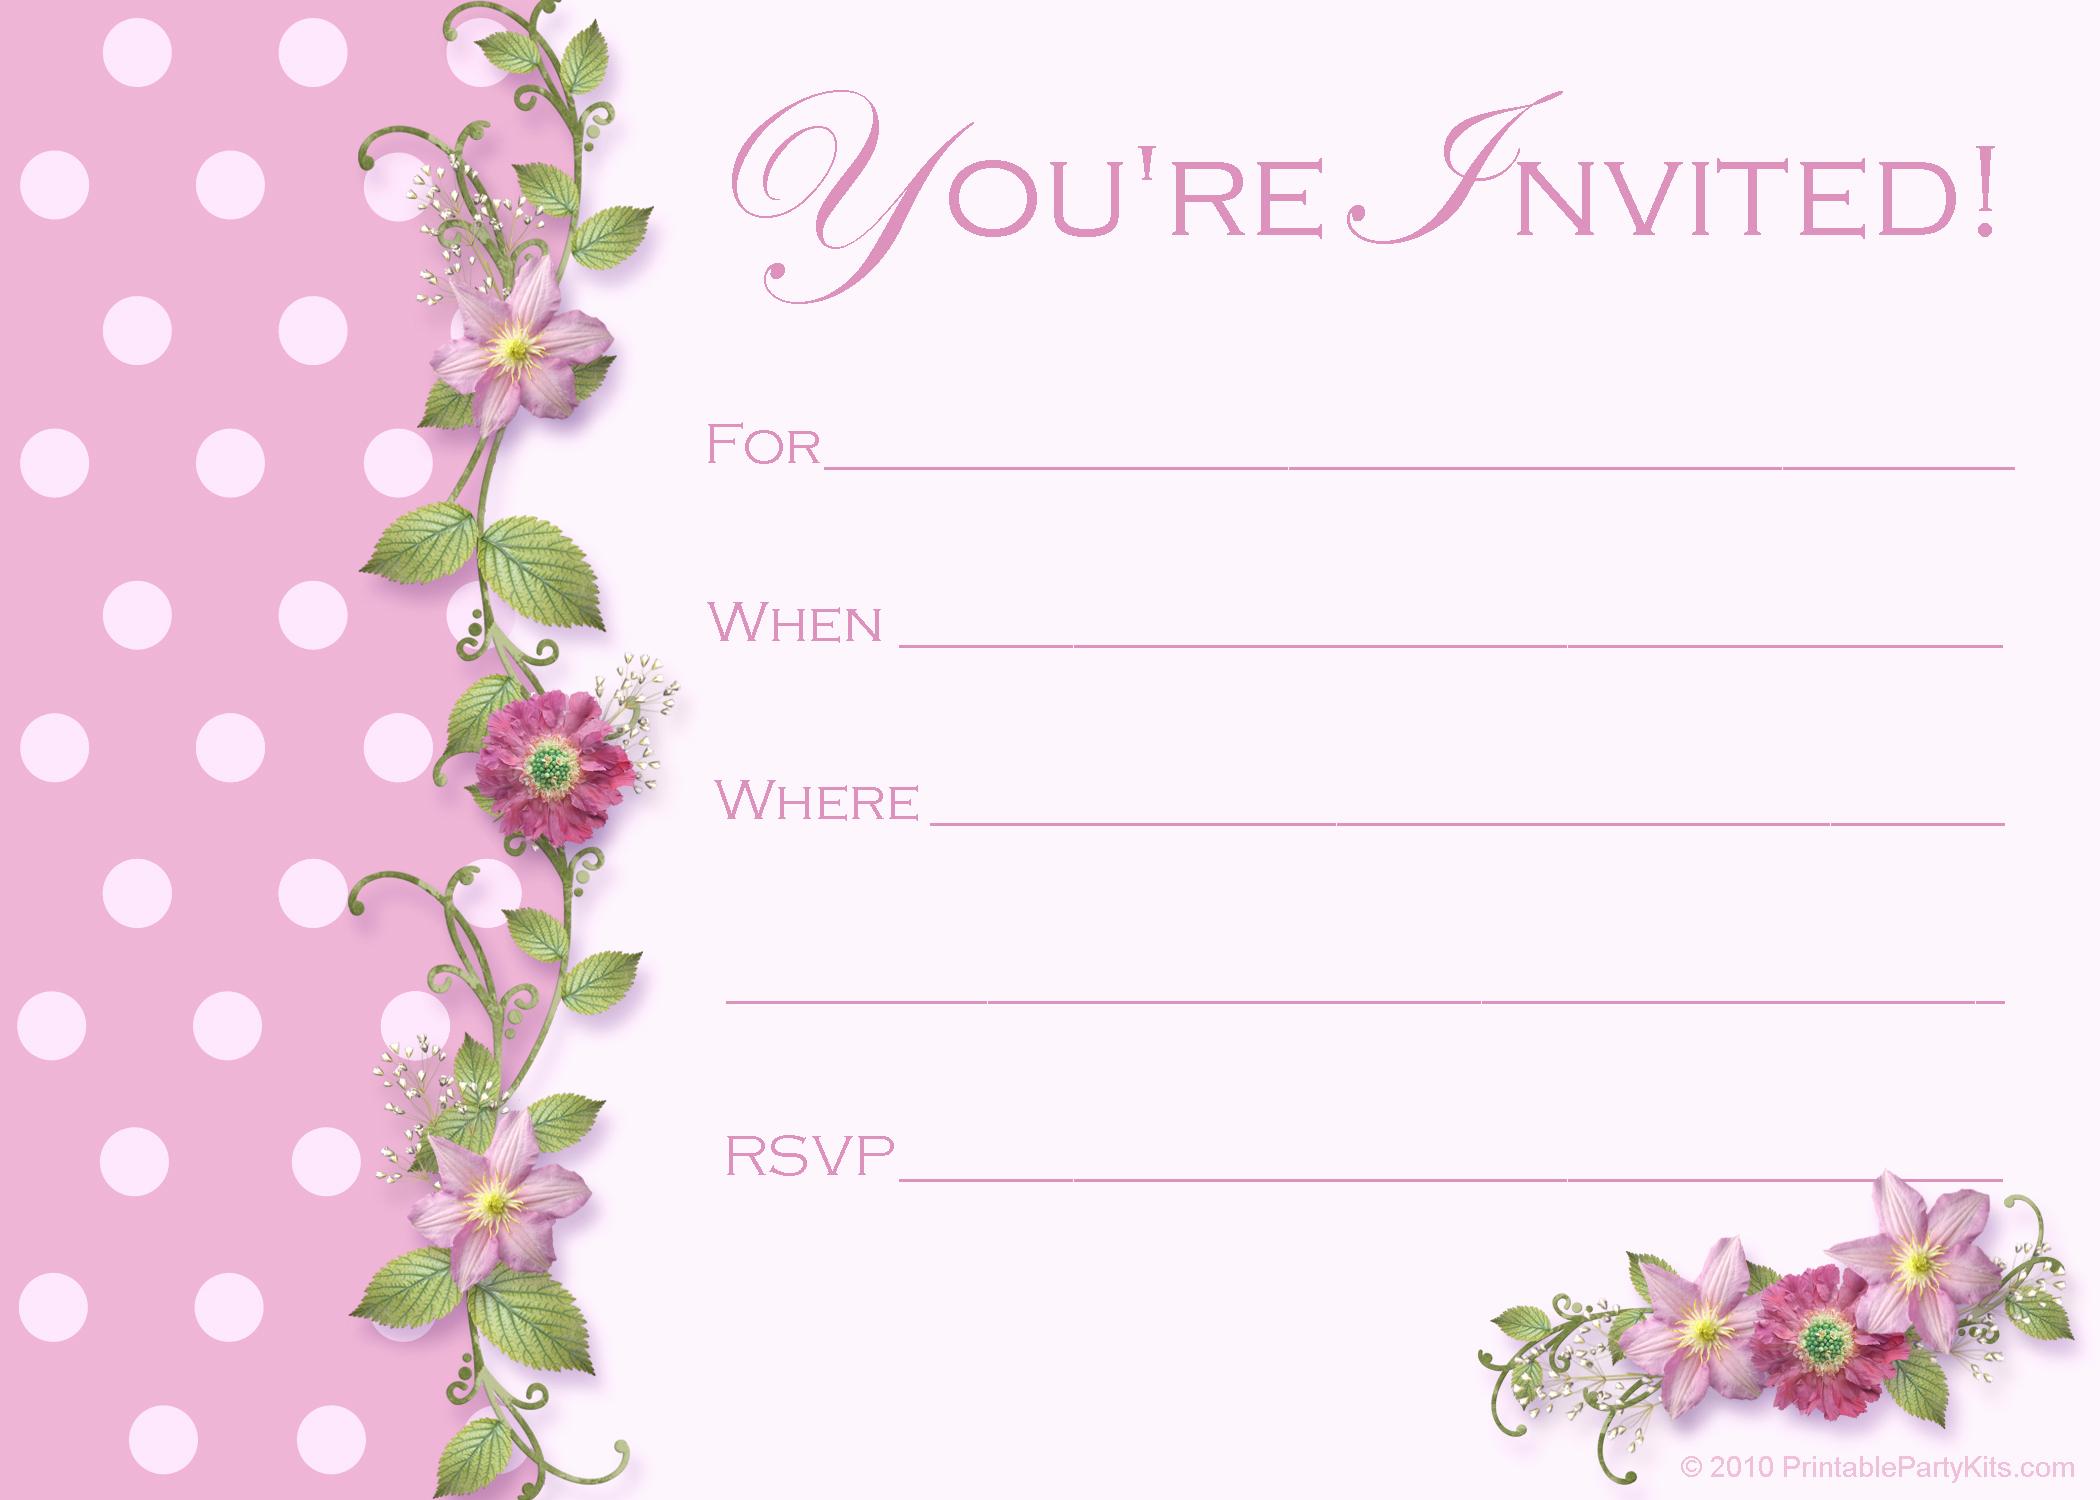 Free Printable Invitation Templates New Free Sweet 16 Birthday Invitations – Free Printable